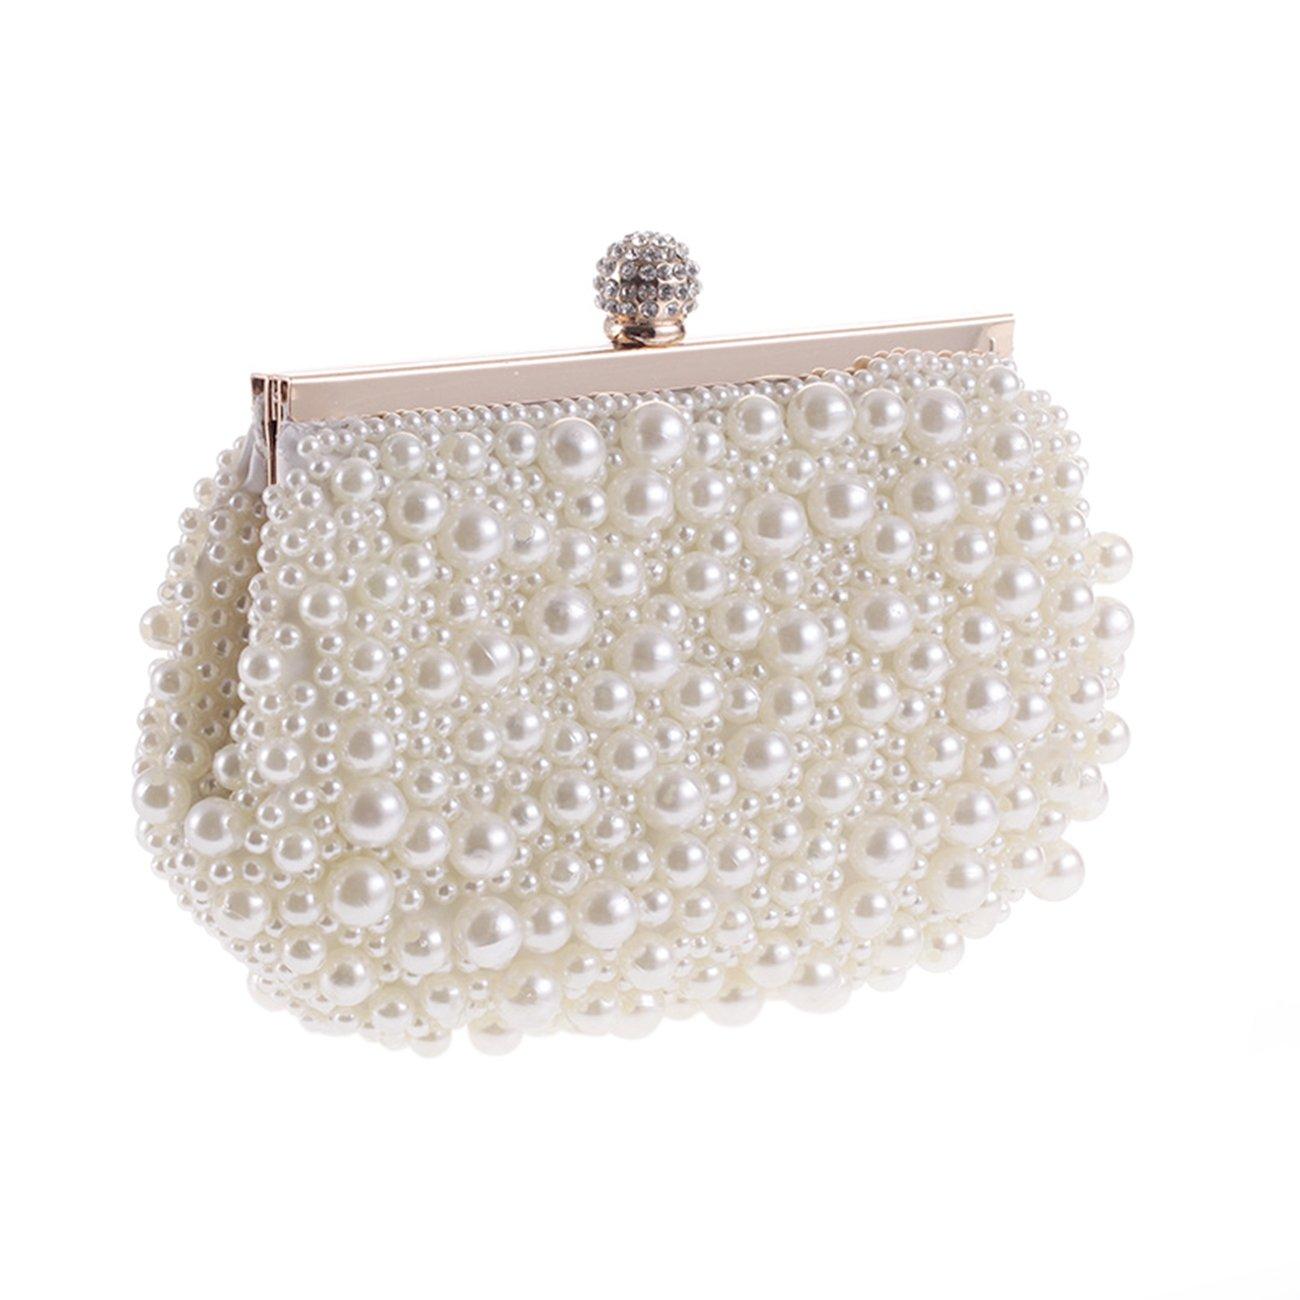 Fit&Wit Evening Bag, Artificial Pearl Clutch Purse Handbag Shoulder Bag for Women